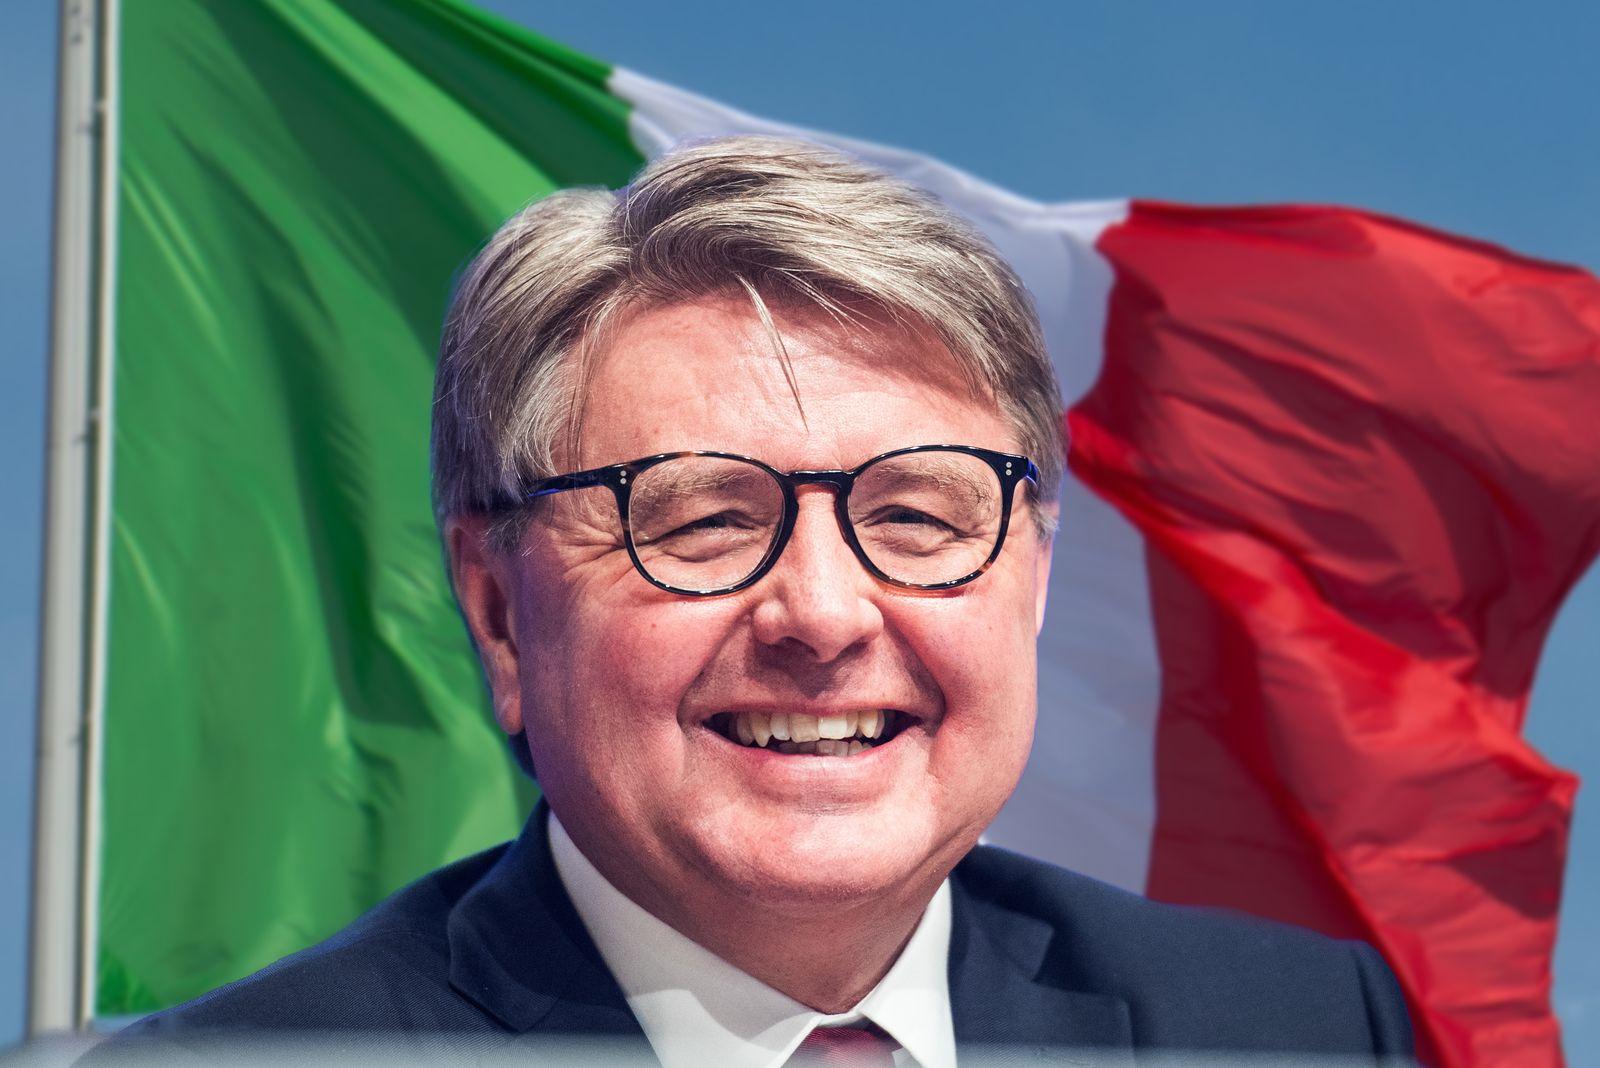 KOMBO Theodor Weimer / Flagge Italien